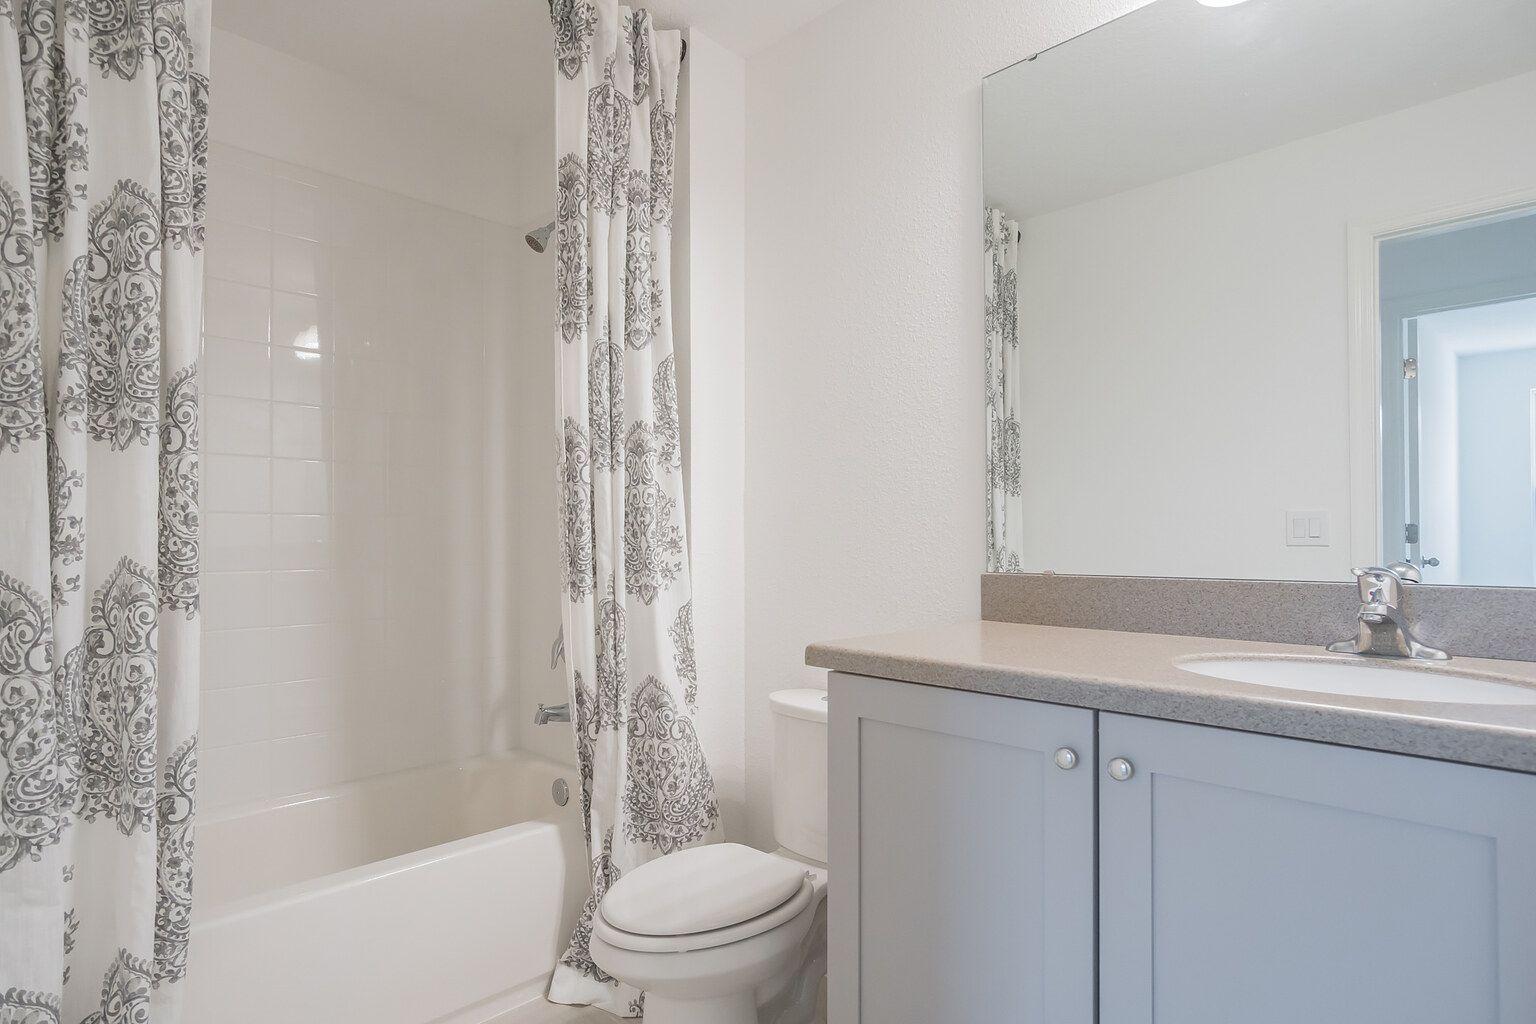 Bathroom featured in the Teton By Ashton Woods in Daytona Beach, FL